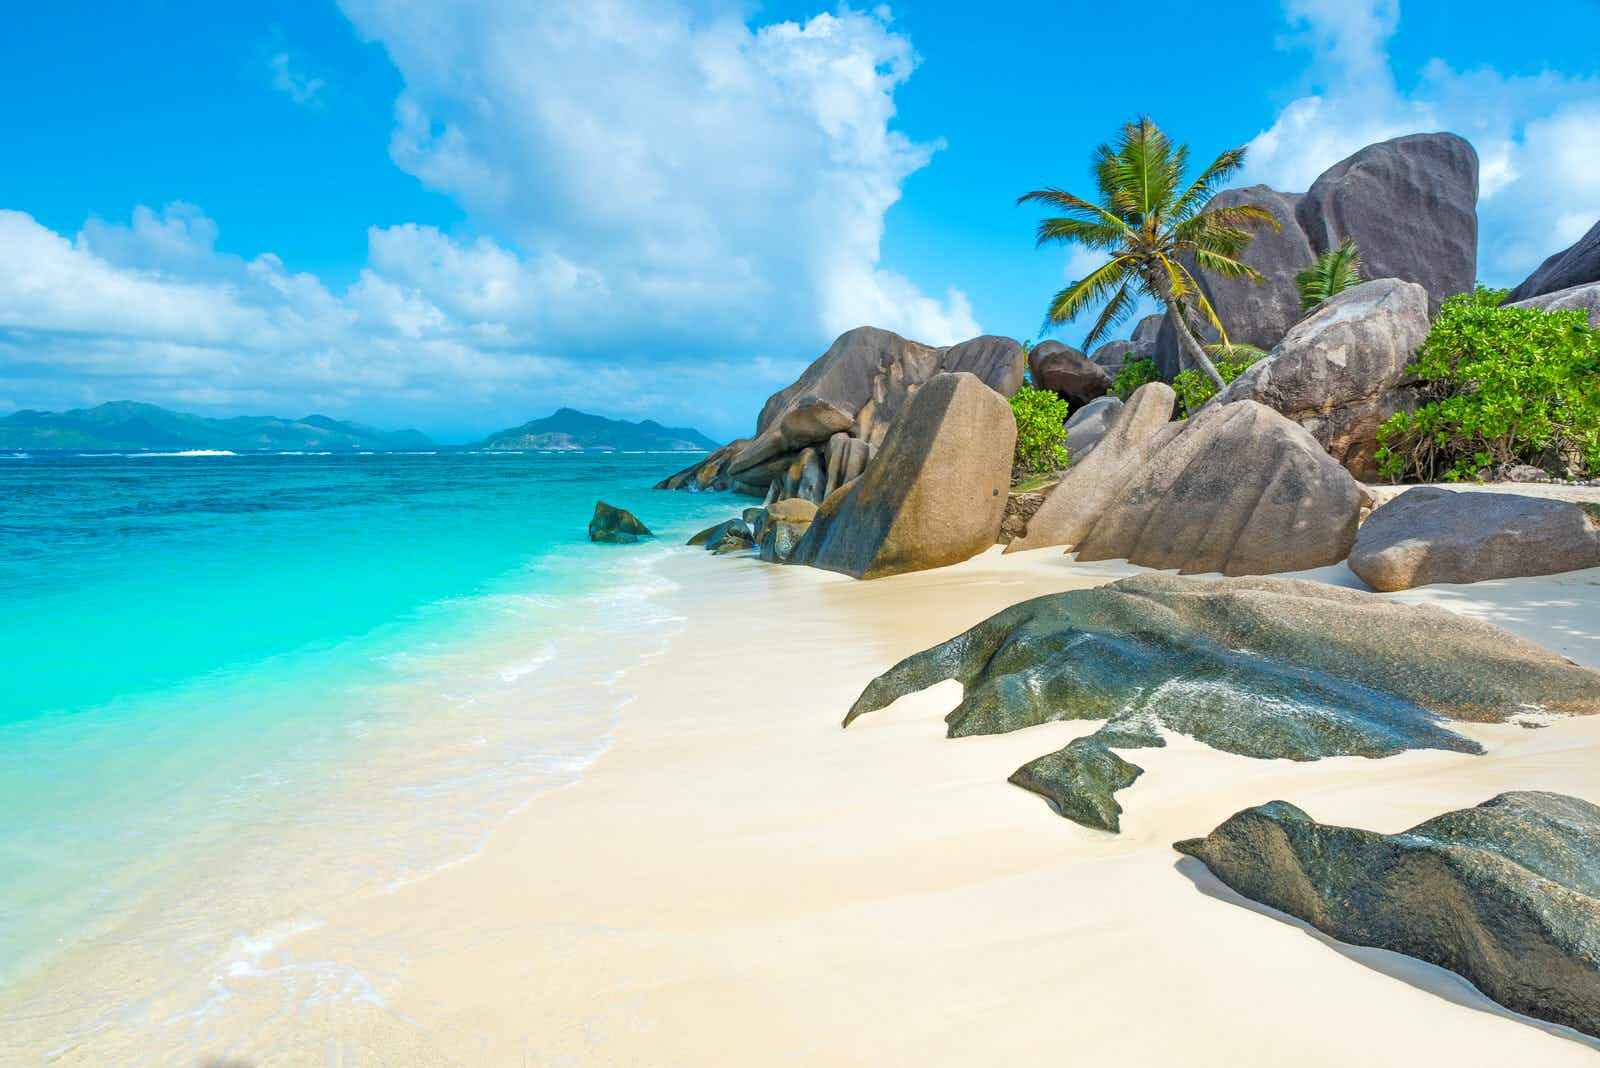 Anse Source d'Argent - beach on island in Seychelles